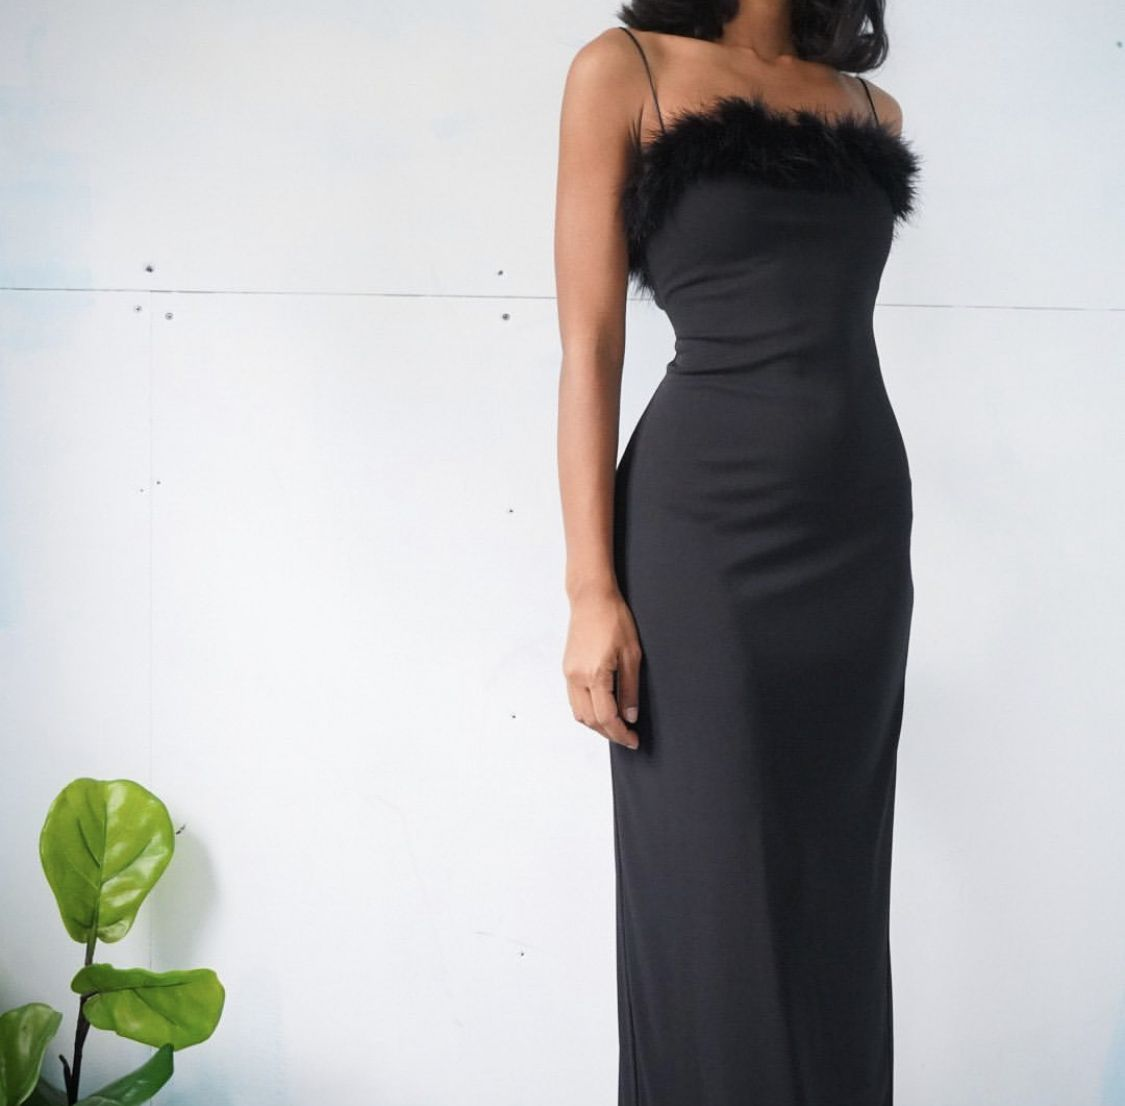 Masha Jlynn Prom Dress Inspiration Elegant Prom Dresses Dresses [ 1106 x 1125 Pixel ]